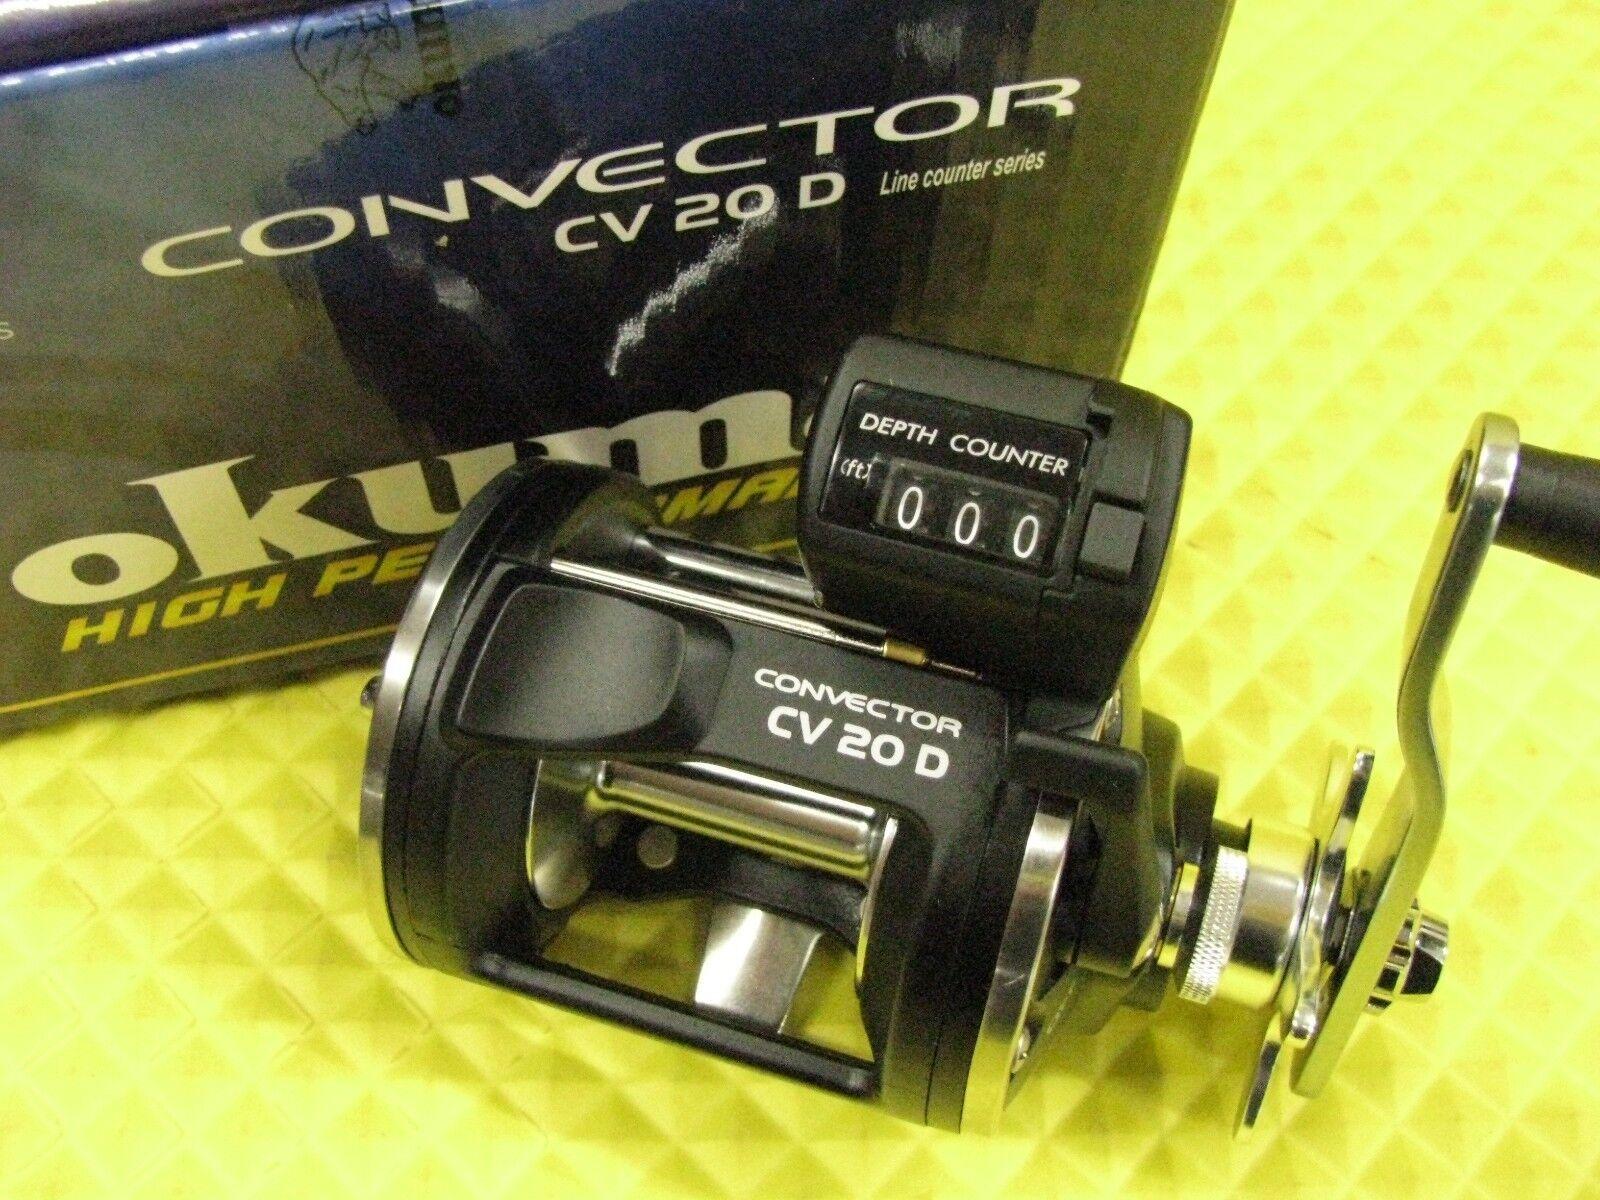 Okuma Convector CV 20D Line Counter Trolling Reel   best service